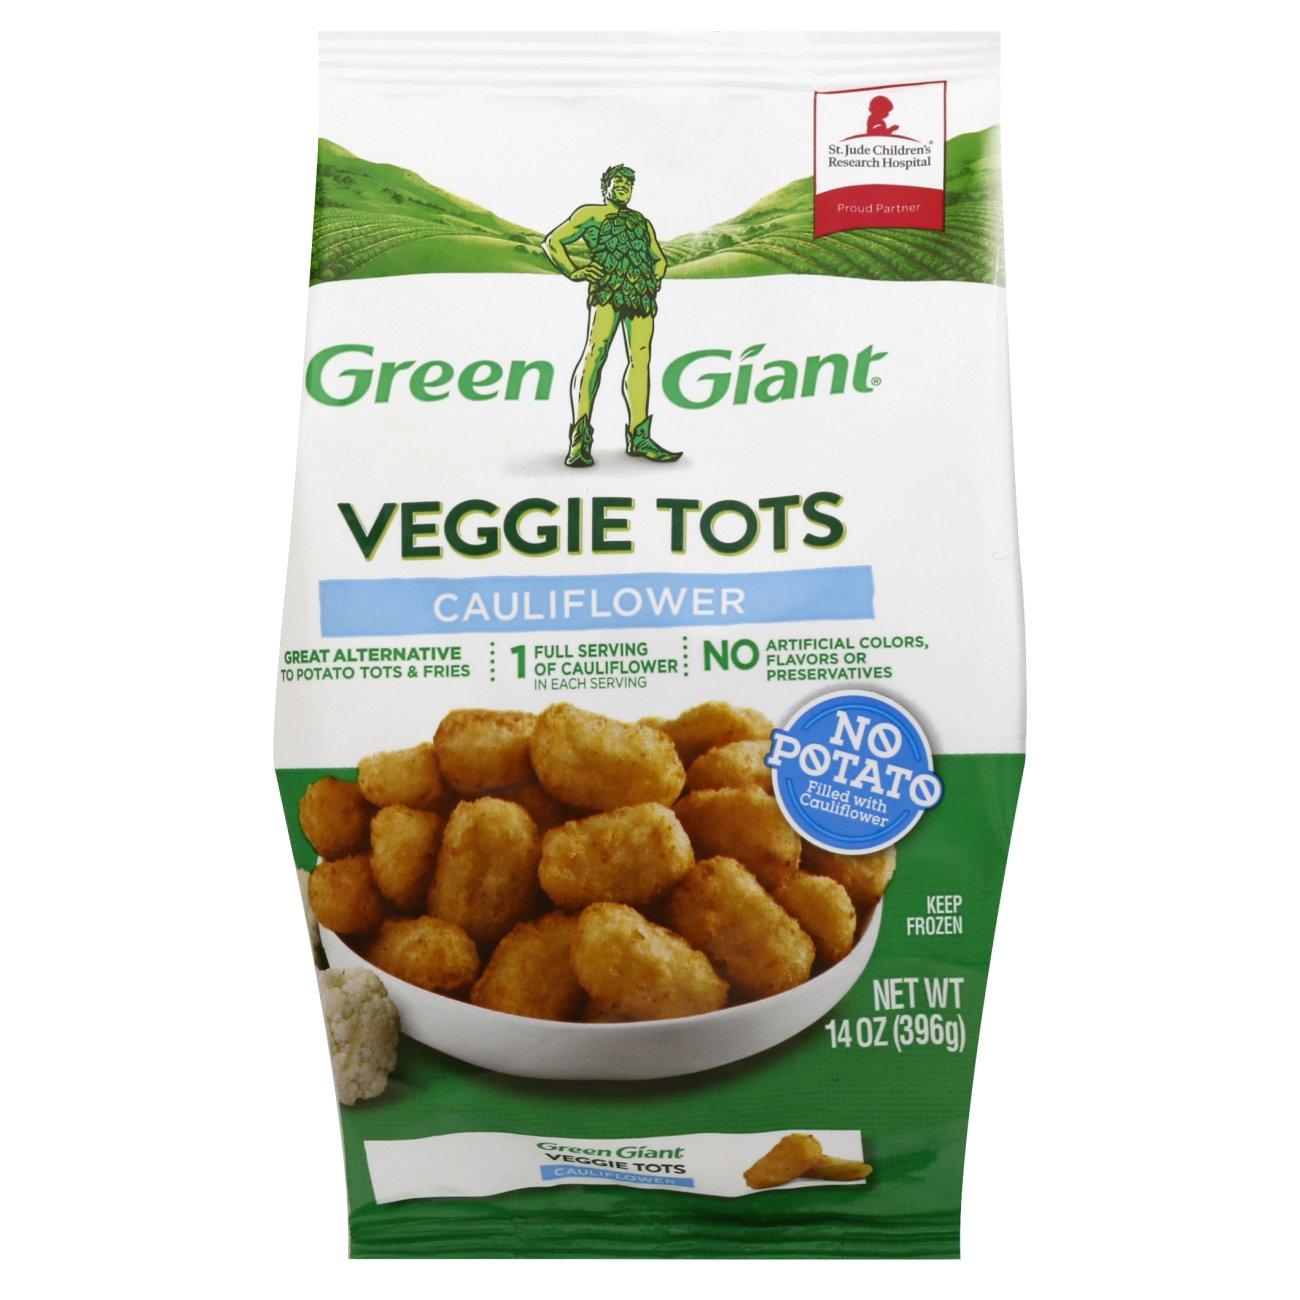 Green Giant Veggie Tots Cauliflower Shop Broccoli Cauliflower Cabbage At H E B